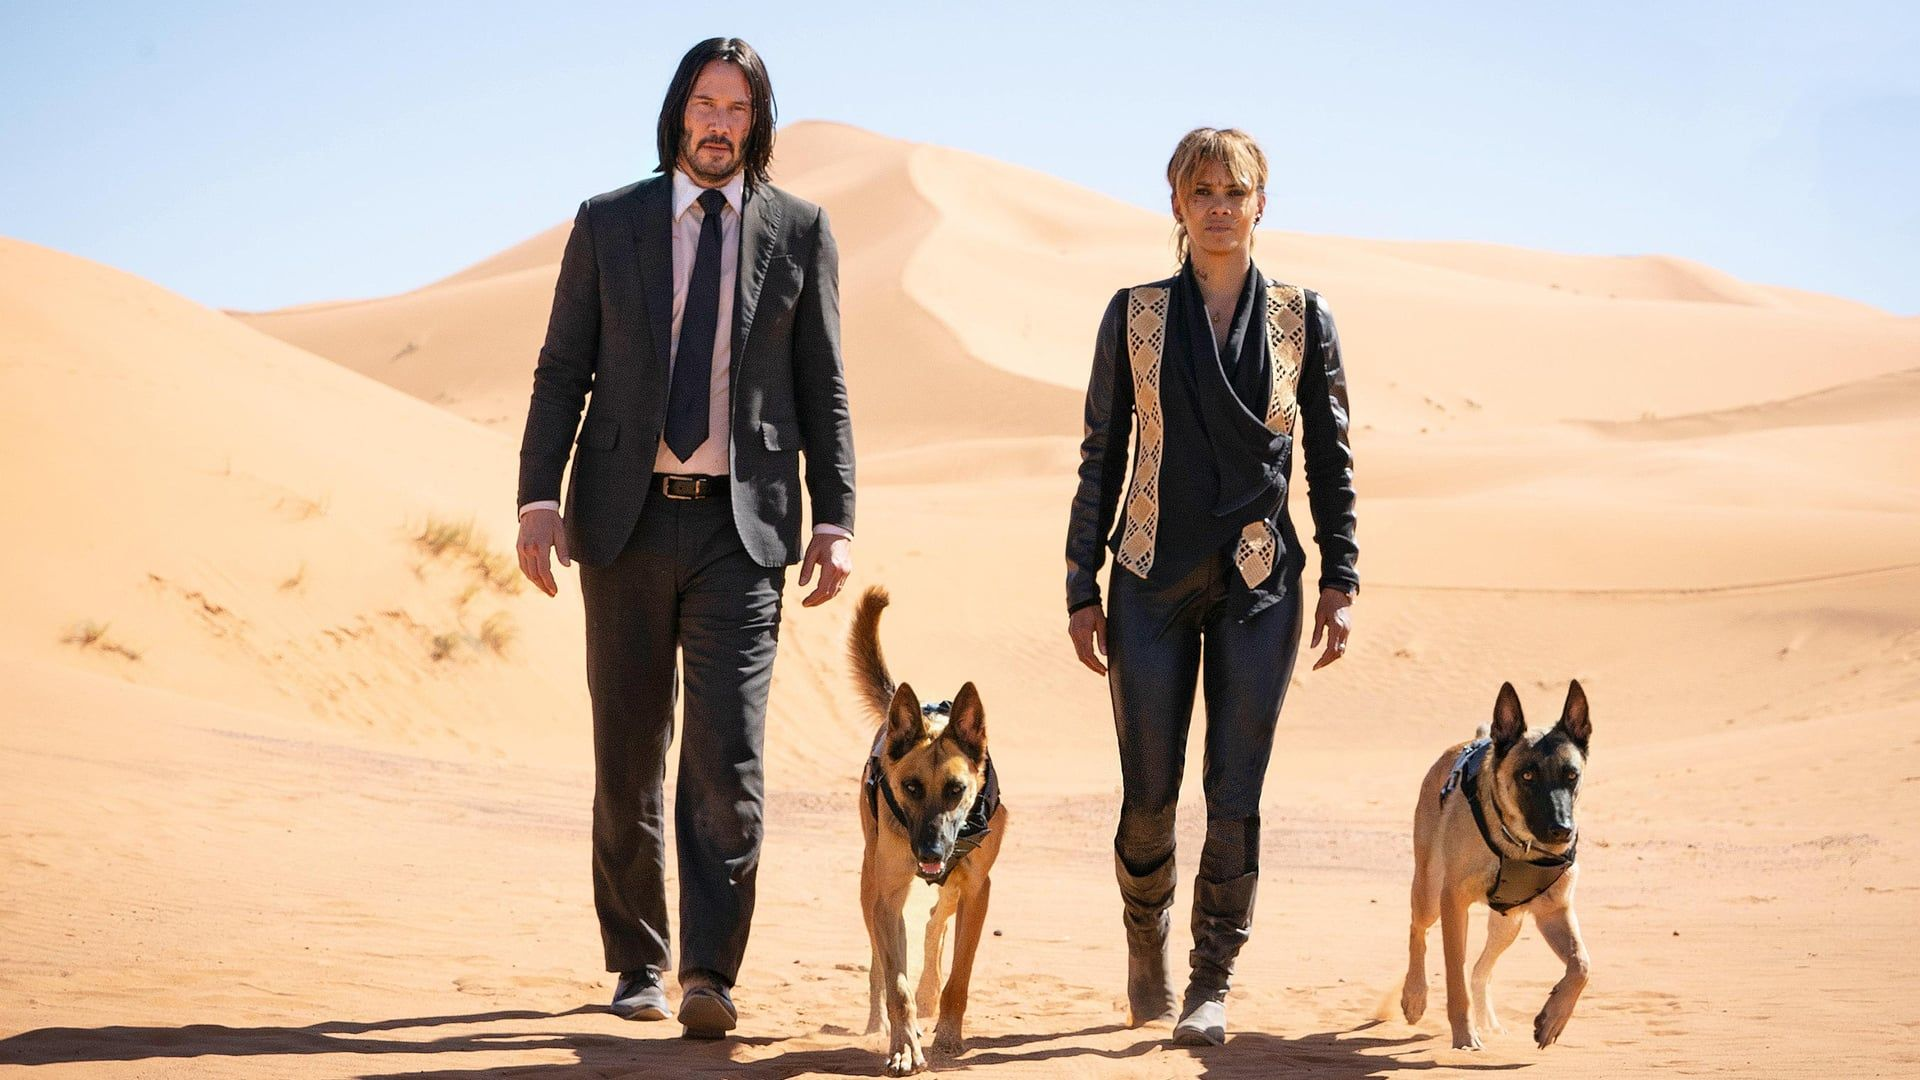 John Wick 3 Parabellum 2019 Streaming Ita Cb01 Film Completo Italiano Altadefinizione John Wick E In Fuga Per Due Keanu Reeves Movies Keanu Reeves John Wick